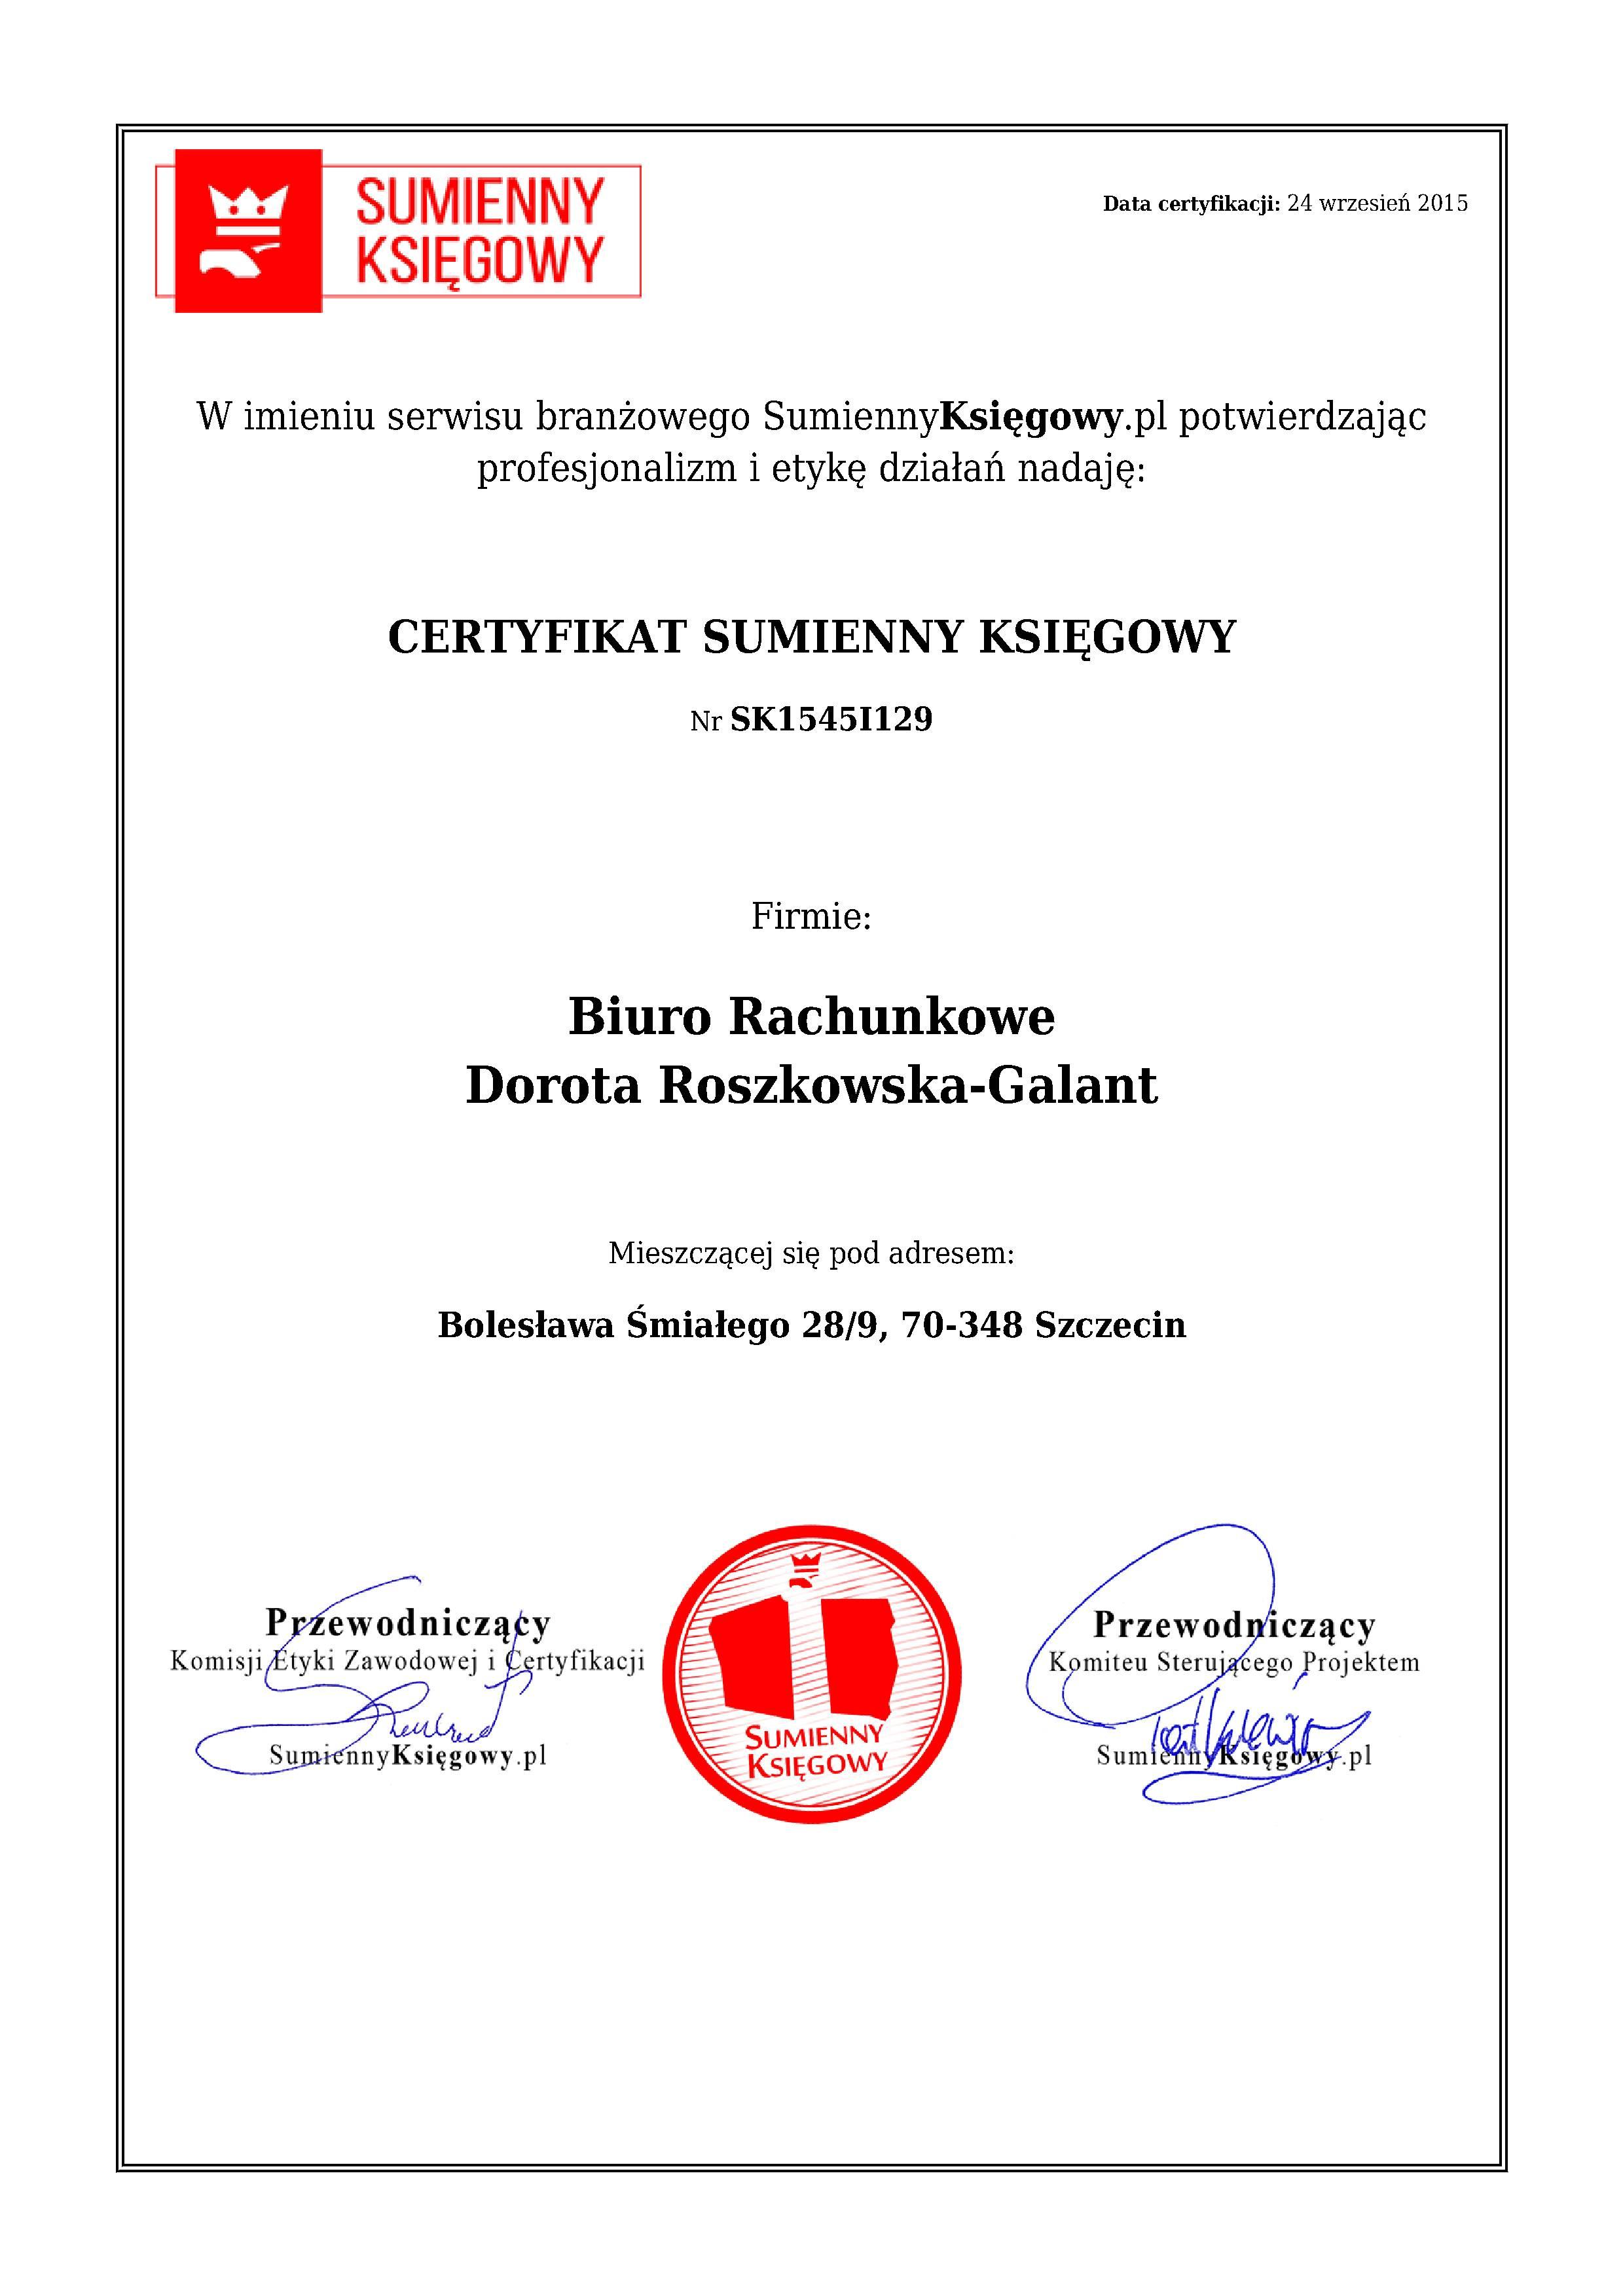 Certyfikat Biuro Rachunkowe Dorota Roszkowska-Galant